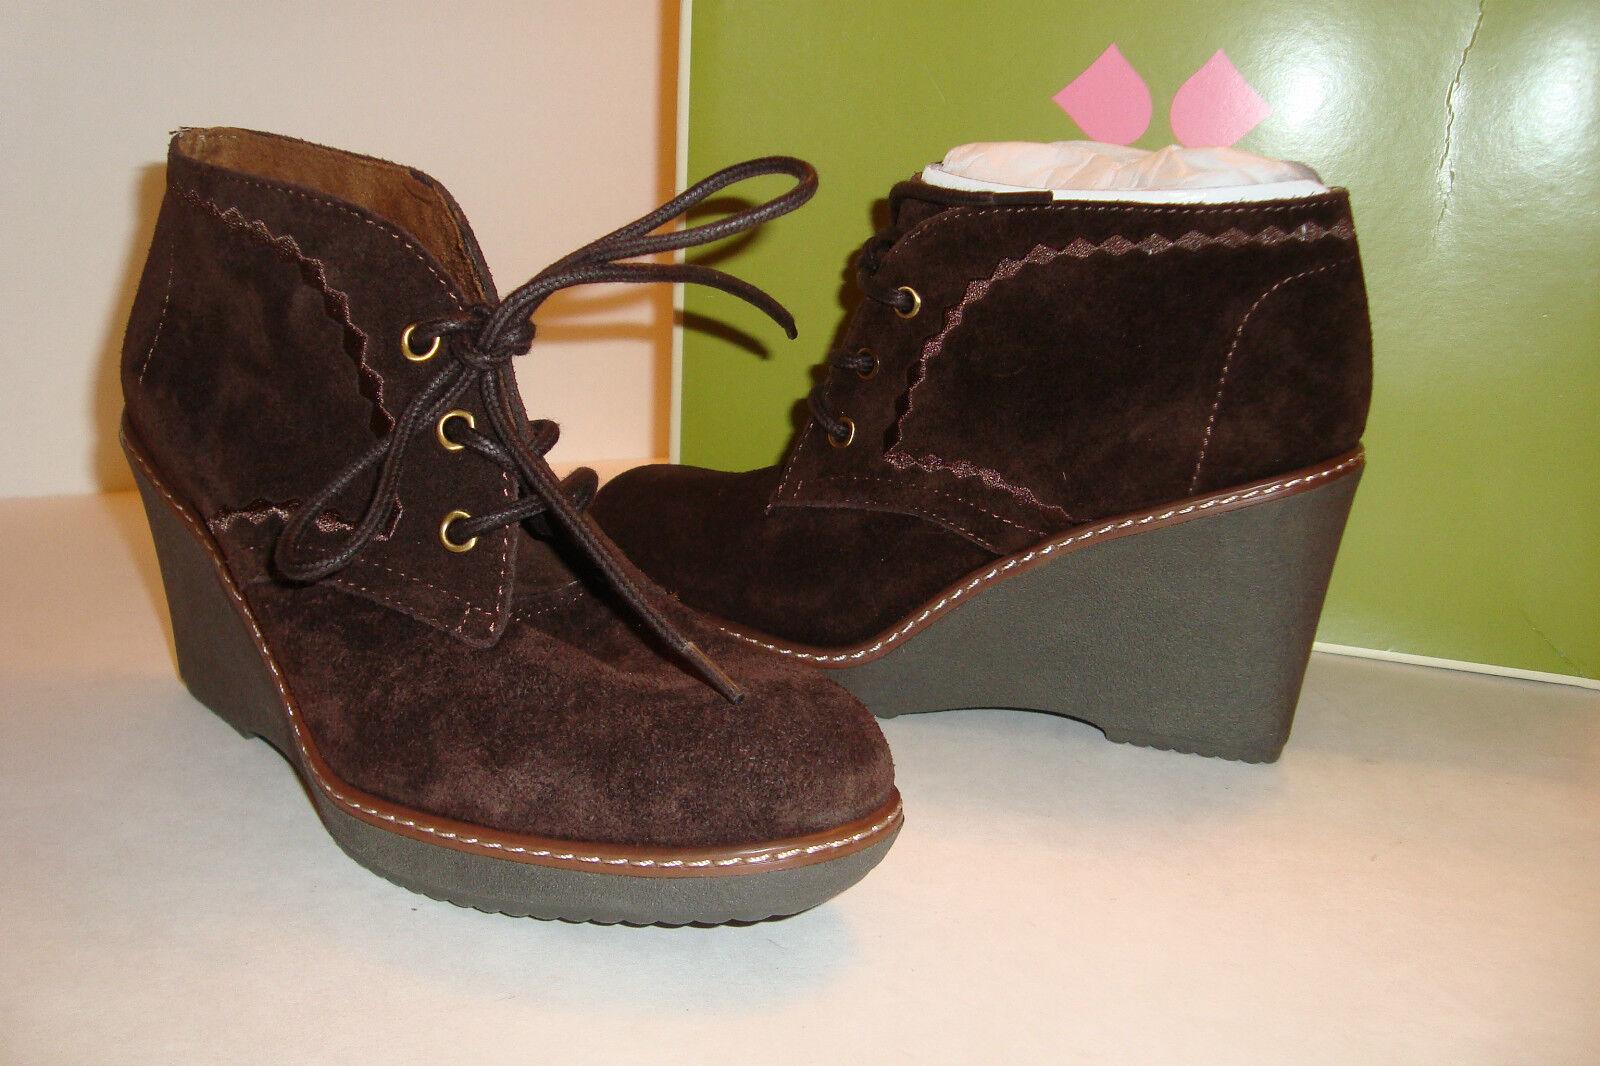 Naturalizer Damenschuhe NWB Kaitlyn Oxford Braun Ankle Wedge Stiefel Schuhes 5.5 MED NEU